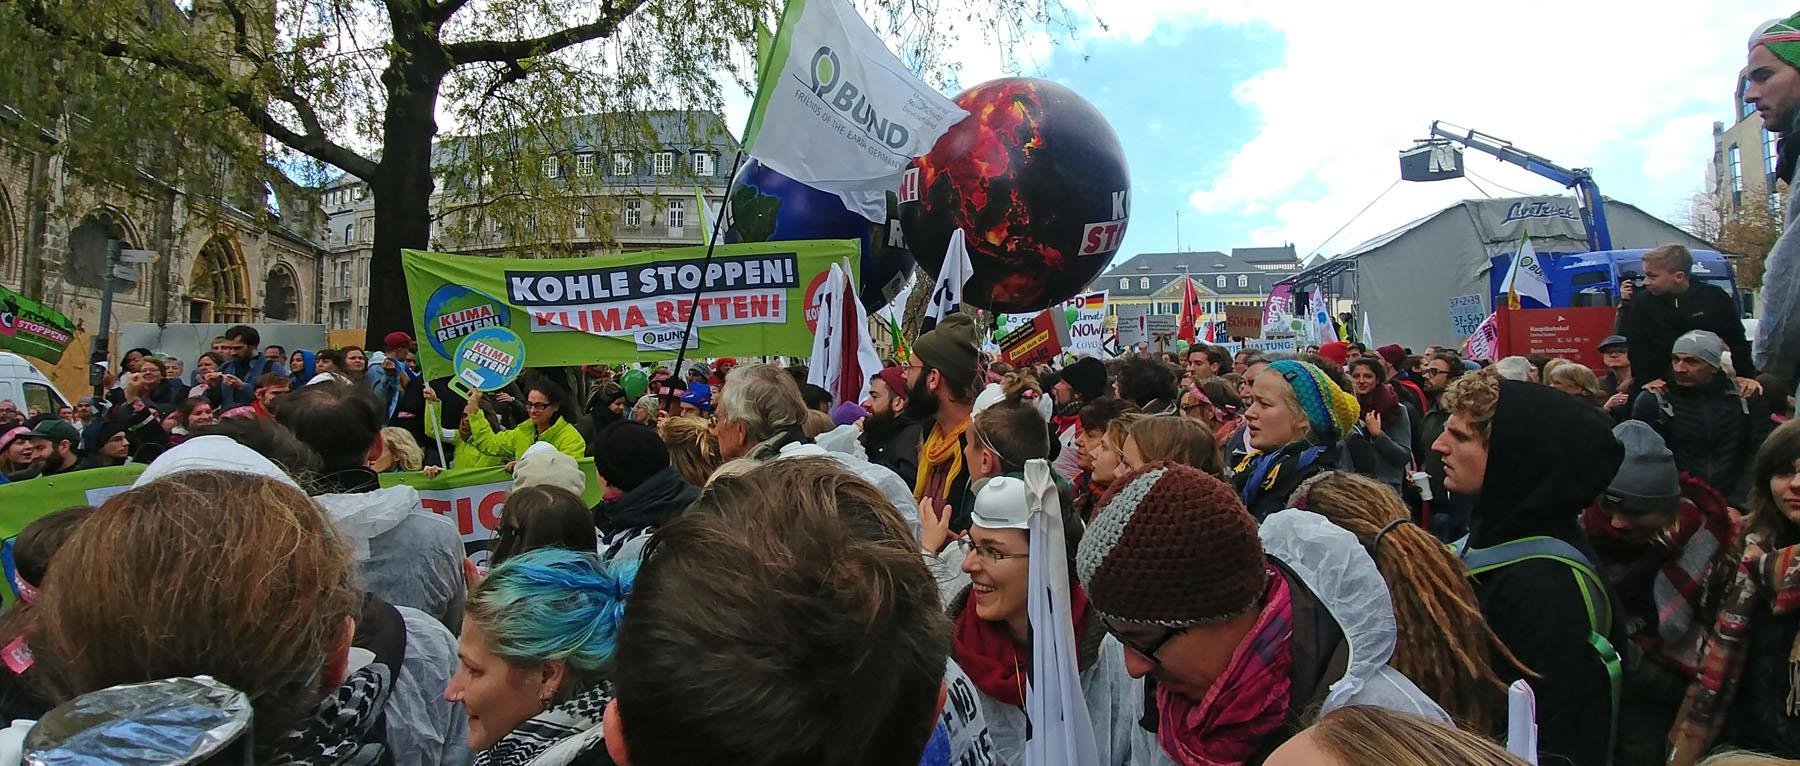 Demo in Bonn: Rote Linie gegen Kohle